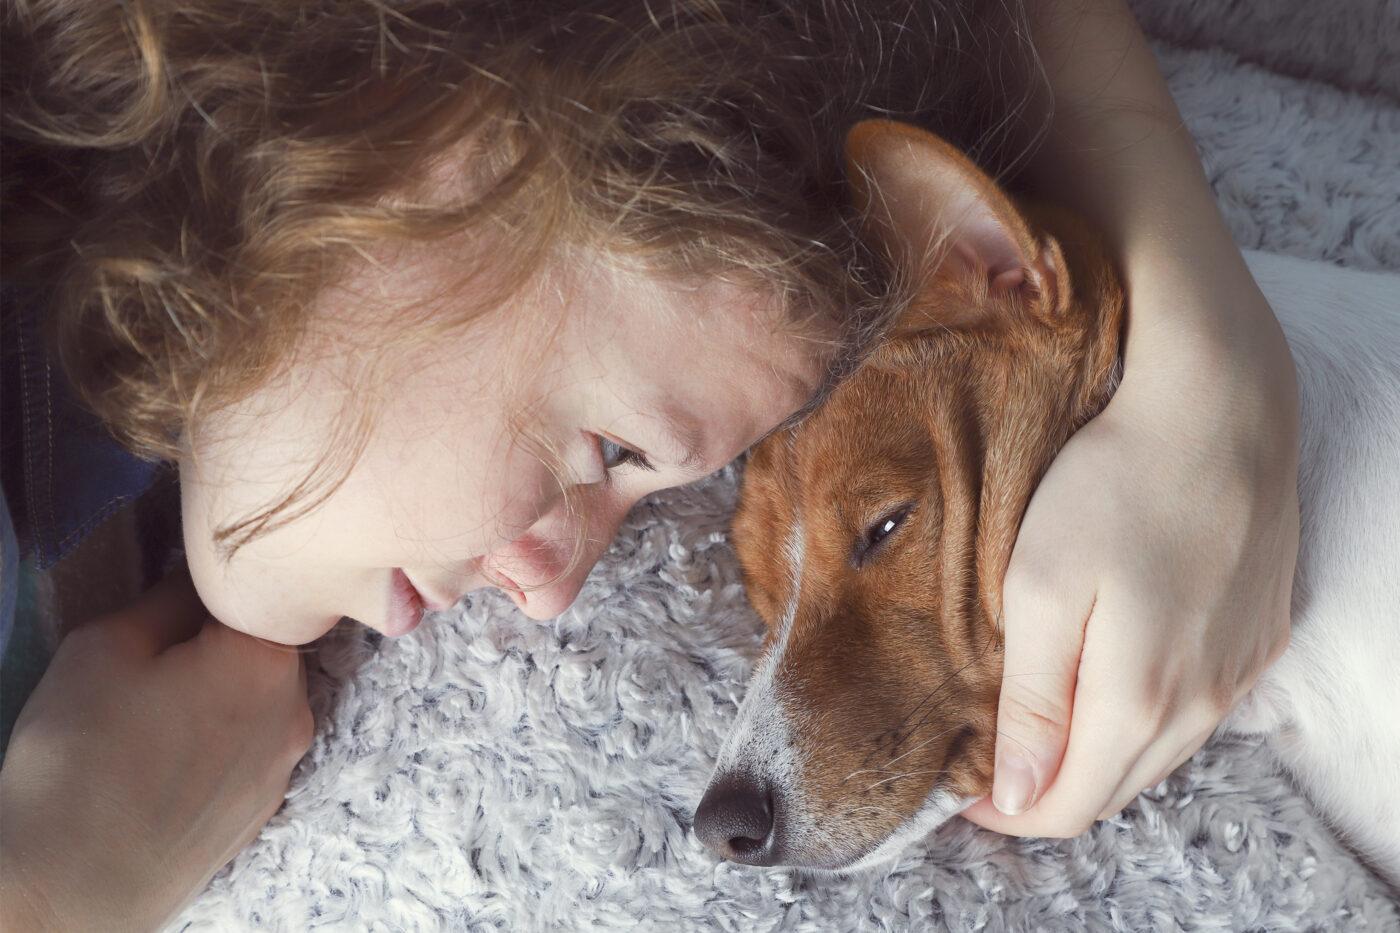 girl-wondering-what-dog-thinking